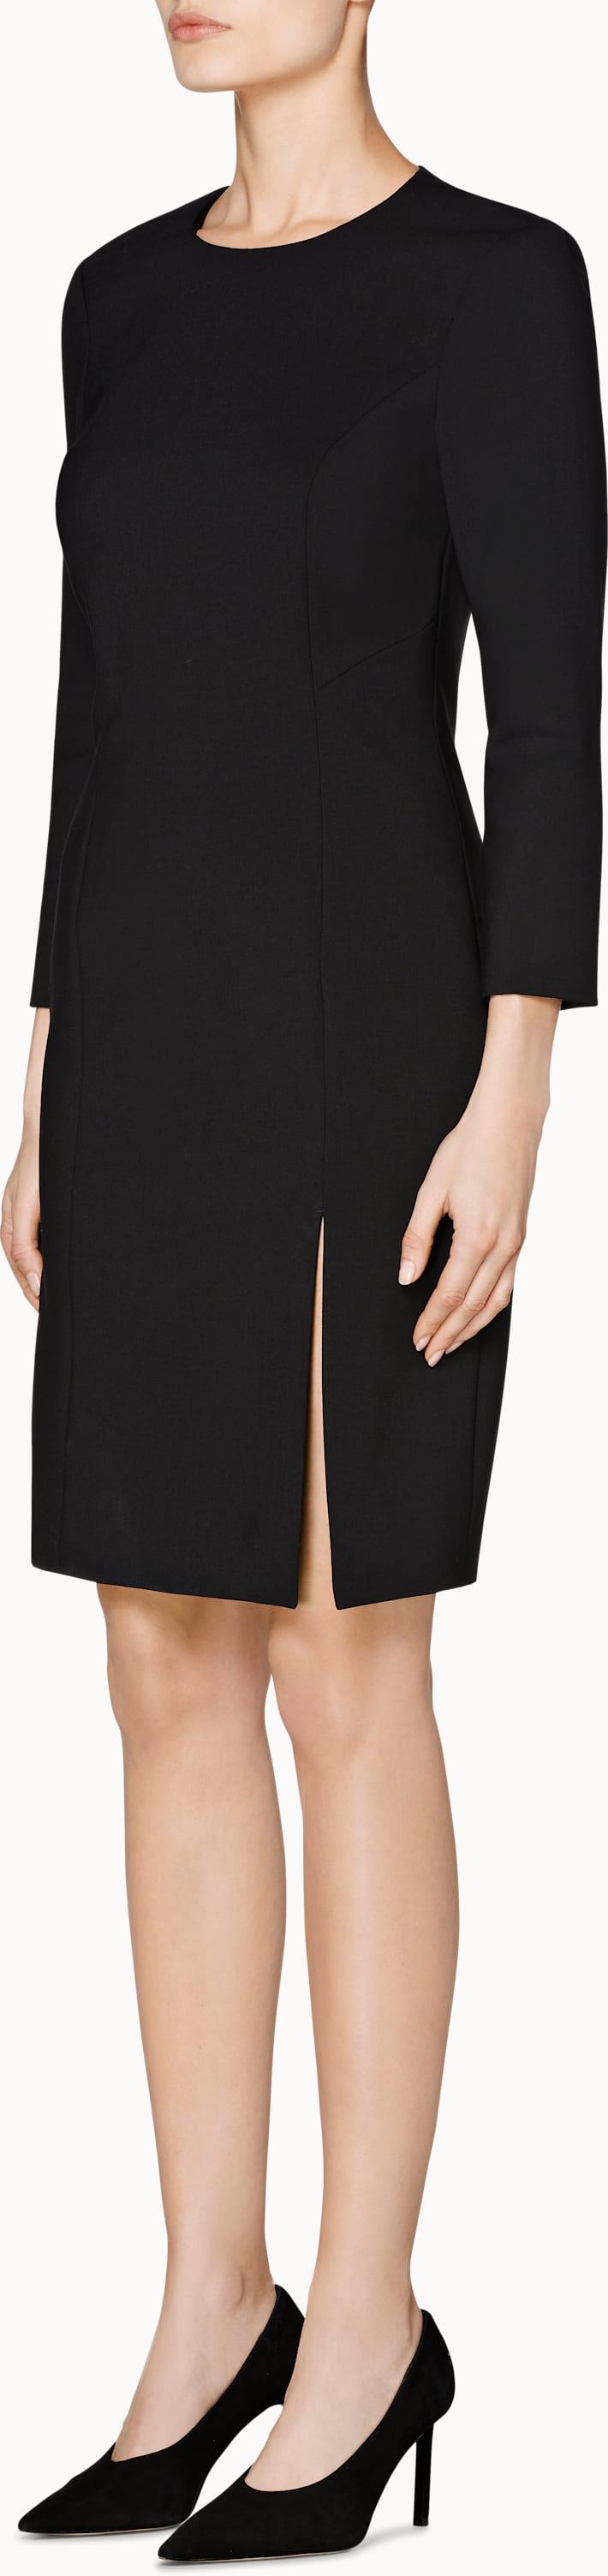 Asia Black  Dress